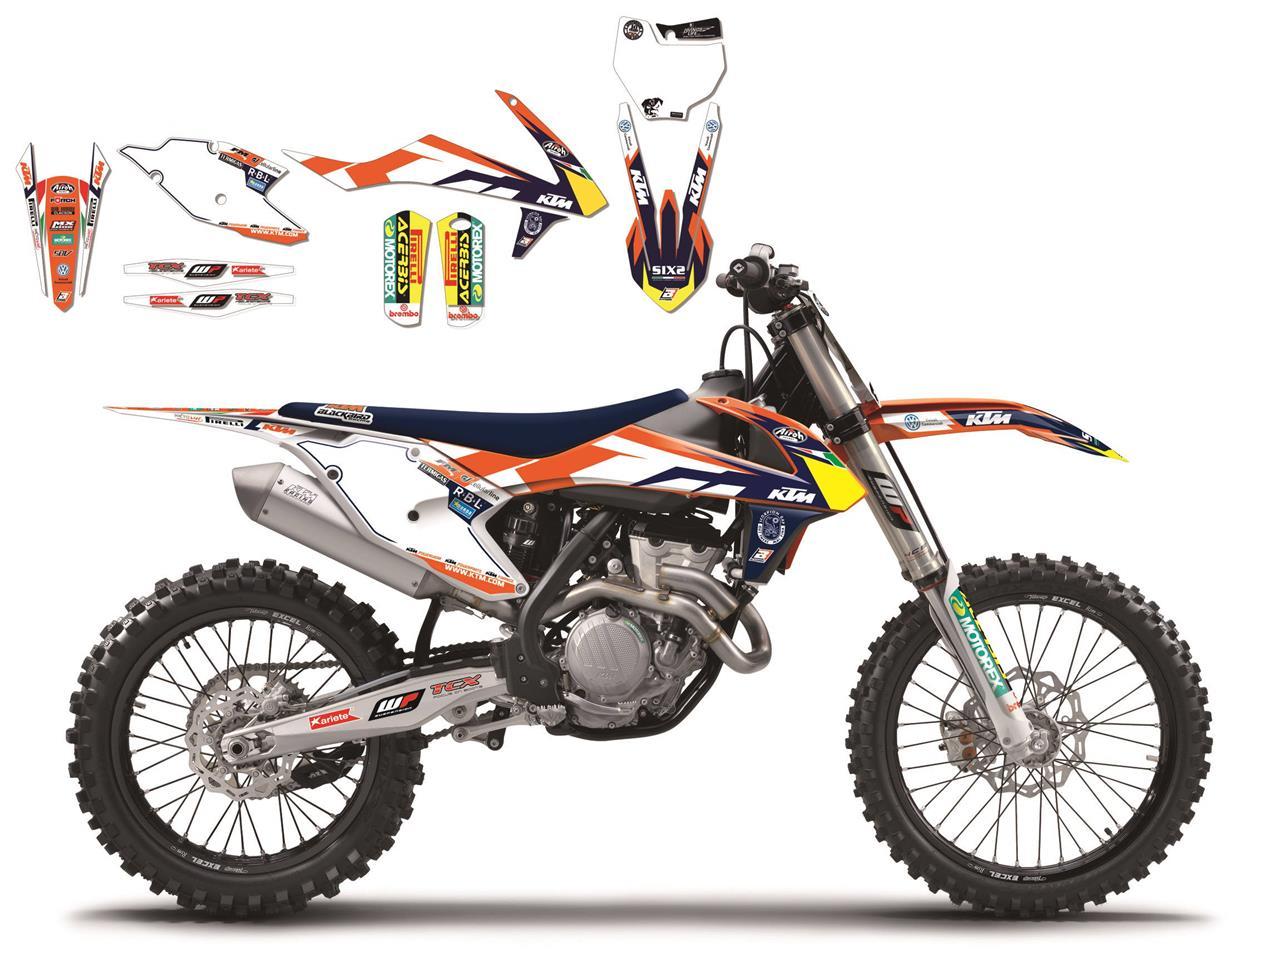 KIT ADHESIVOS BLACKBIRD TEAM KTM TROPHY KTM SX-F 450 16> / KTM SX-F 350 16> / KTM SX-F 250 16> / KT